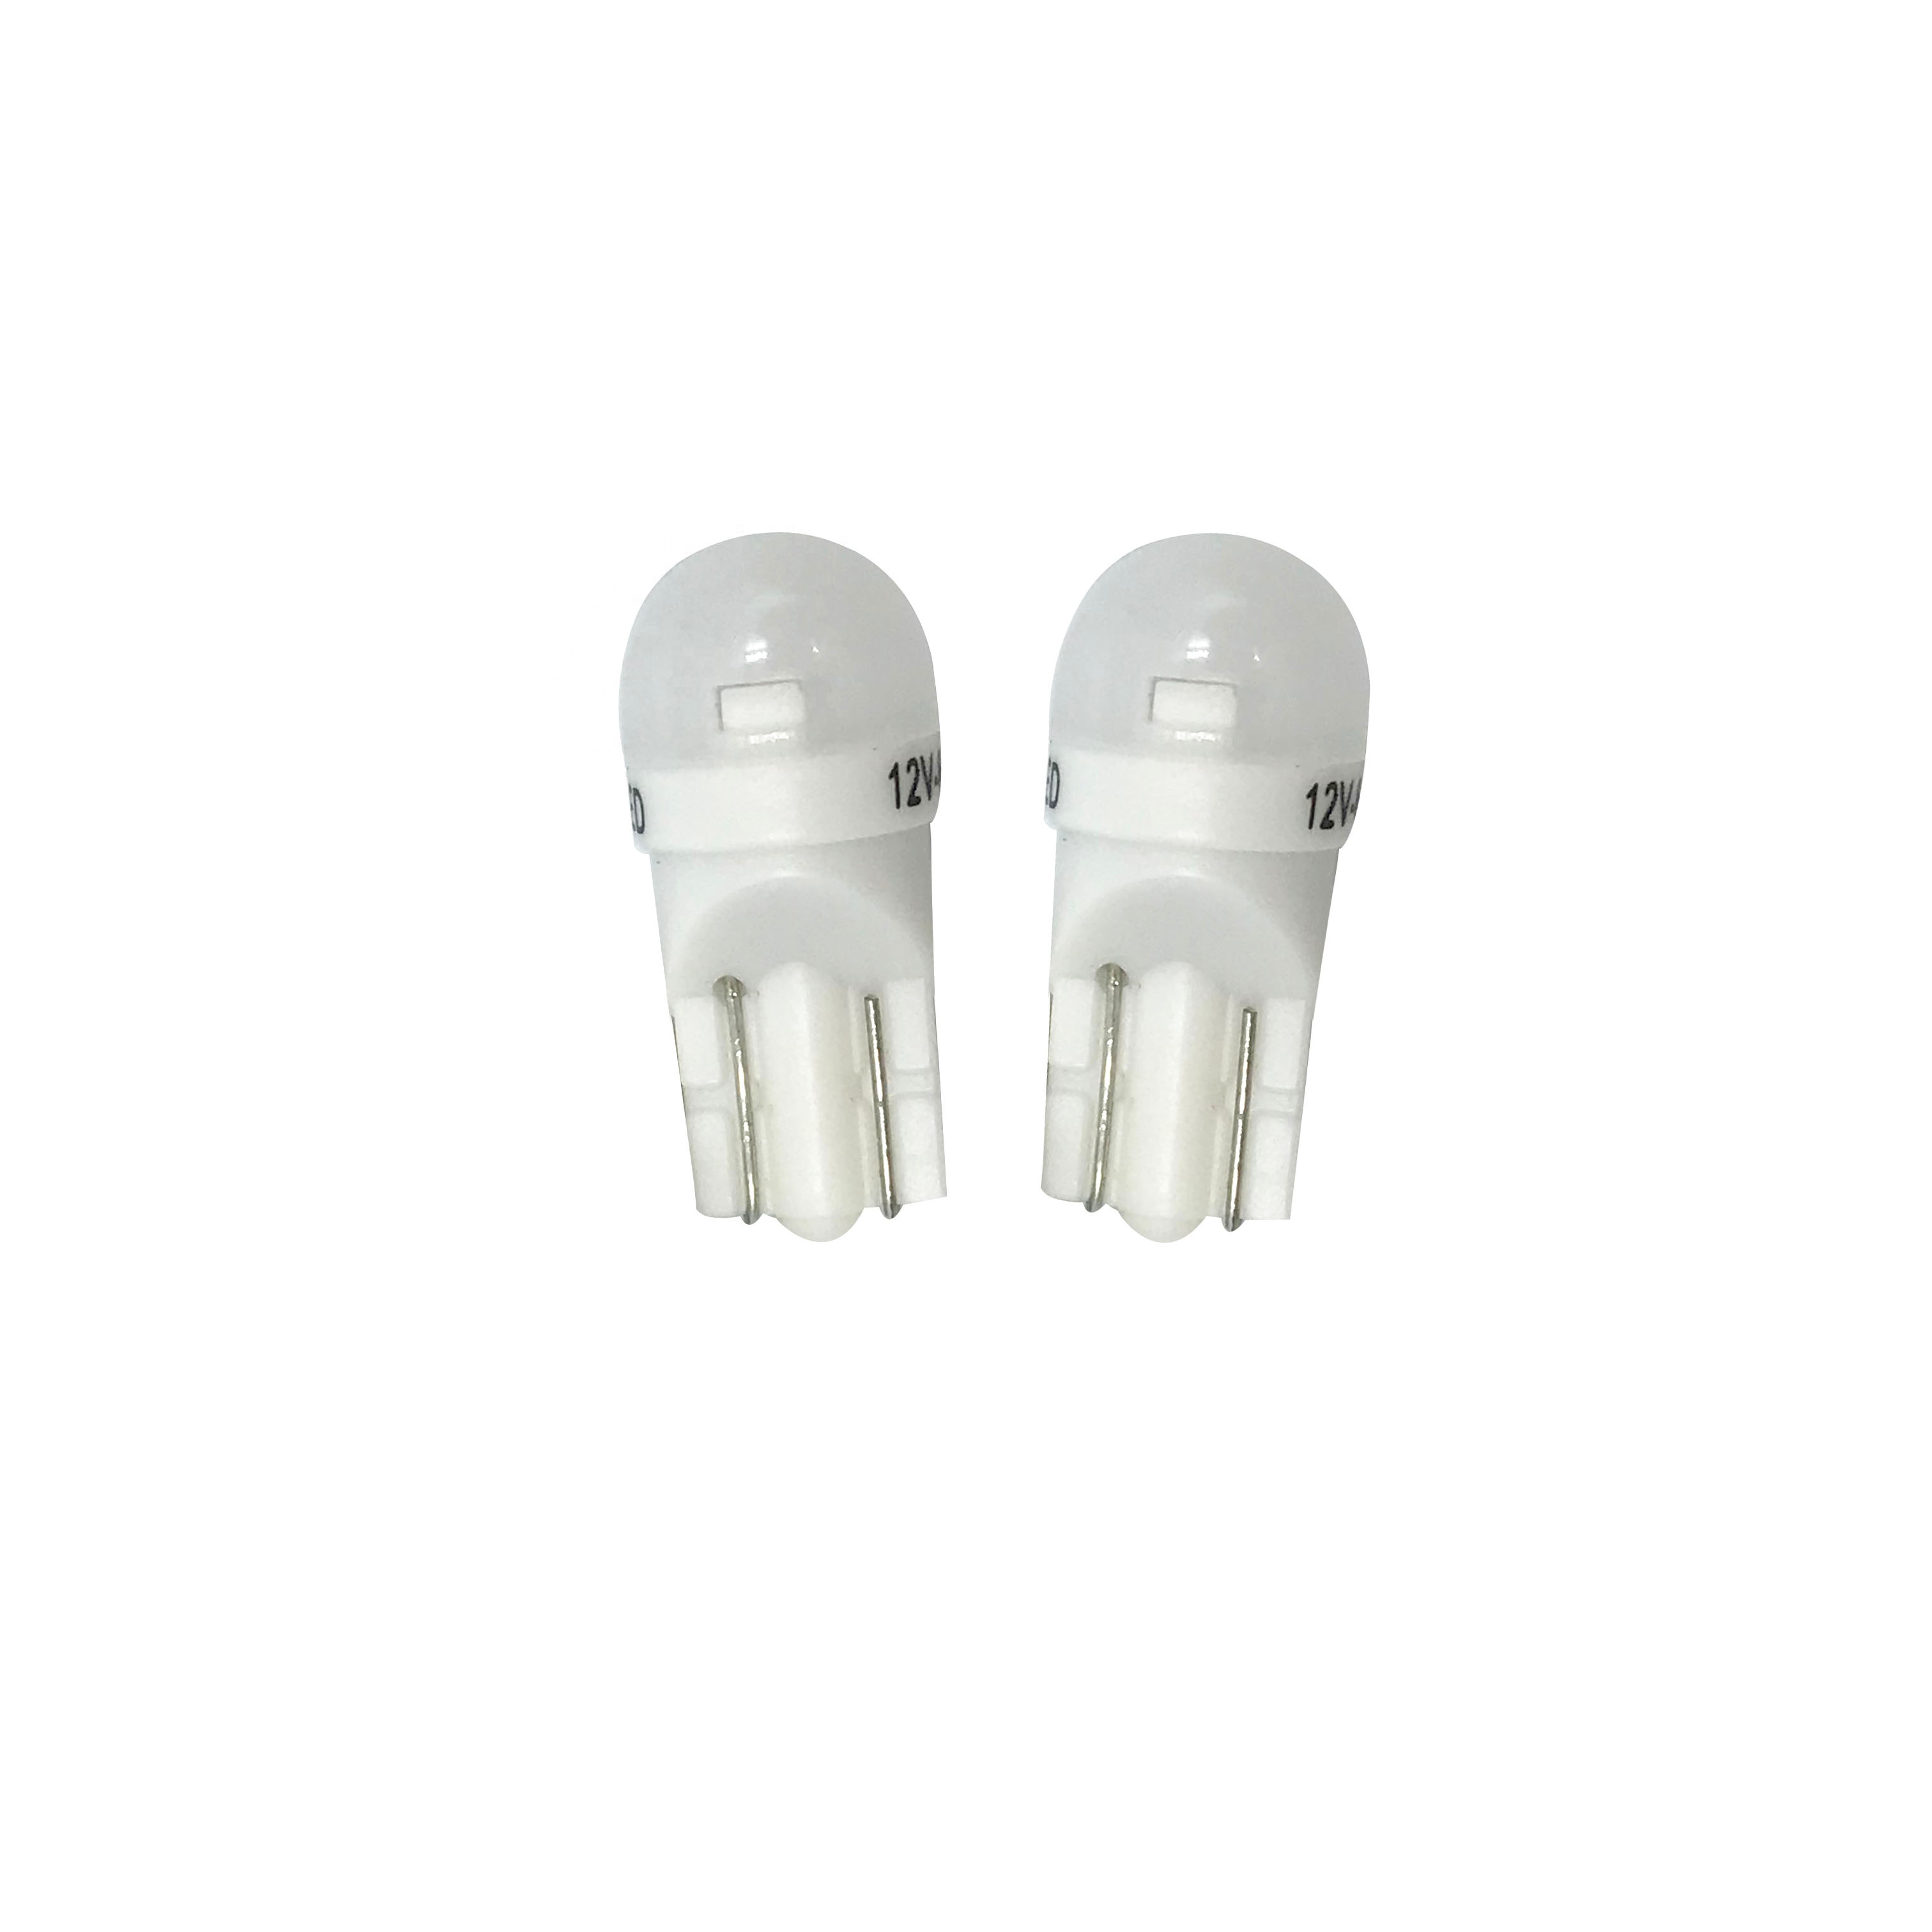 Hot sale 10pcs 3 Colors 12V Car LED T10 194 W5W Canbus No Error T10 Led Light Bulb Parking Reading Lights